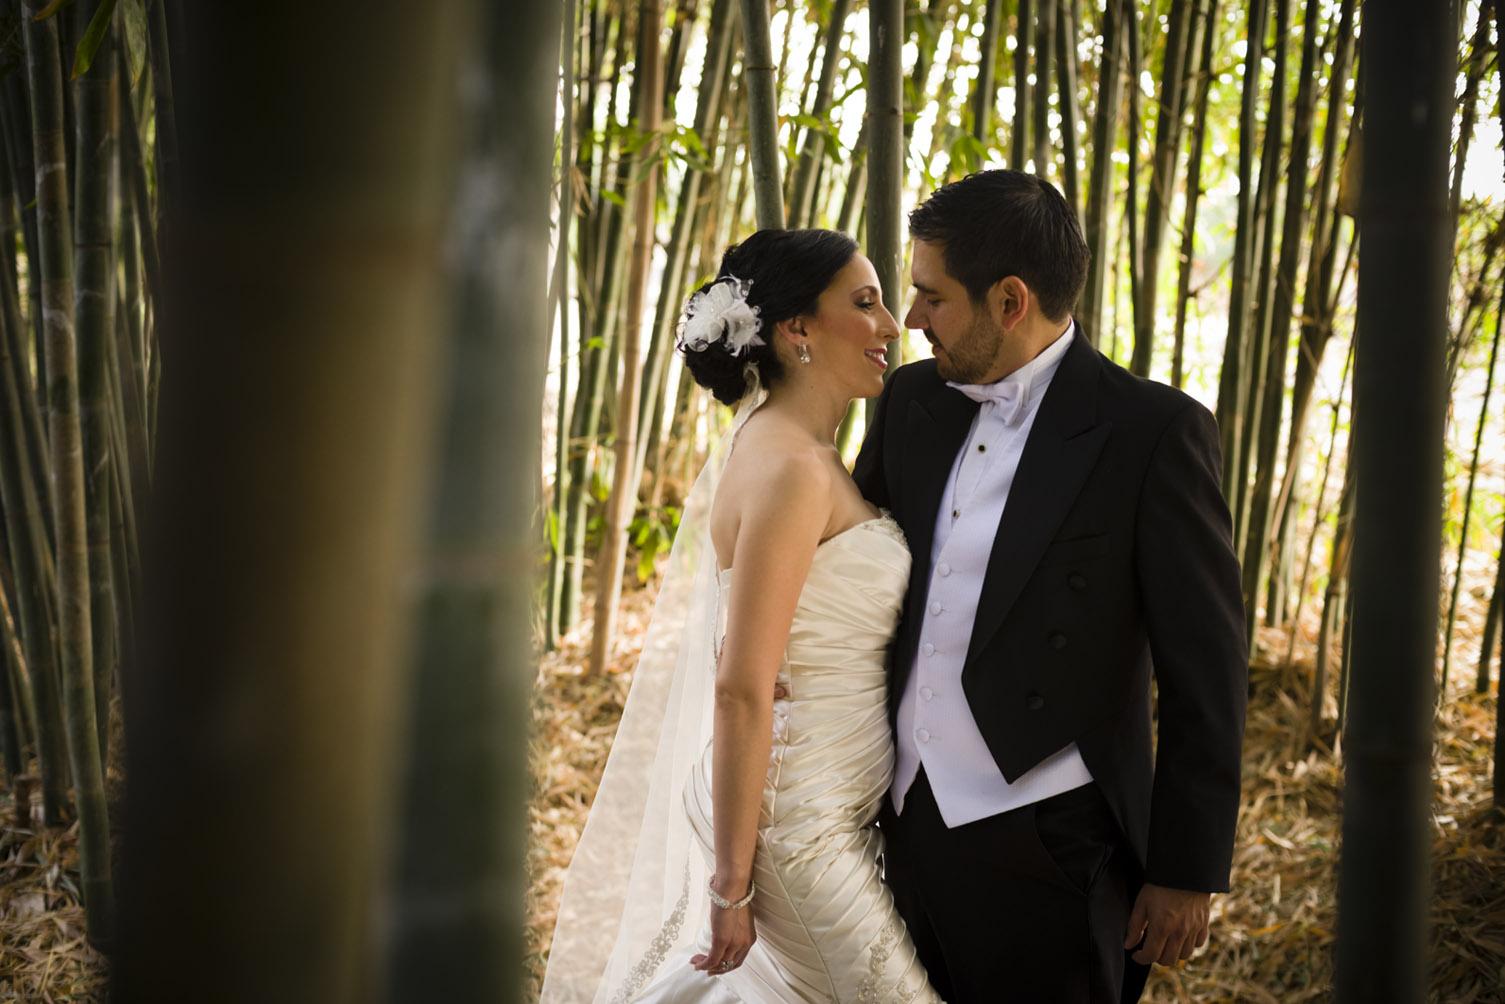 Boda / Wedding.